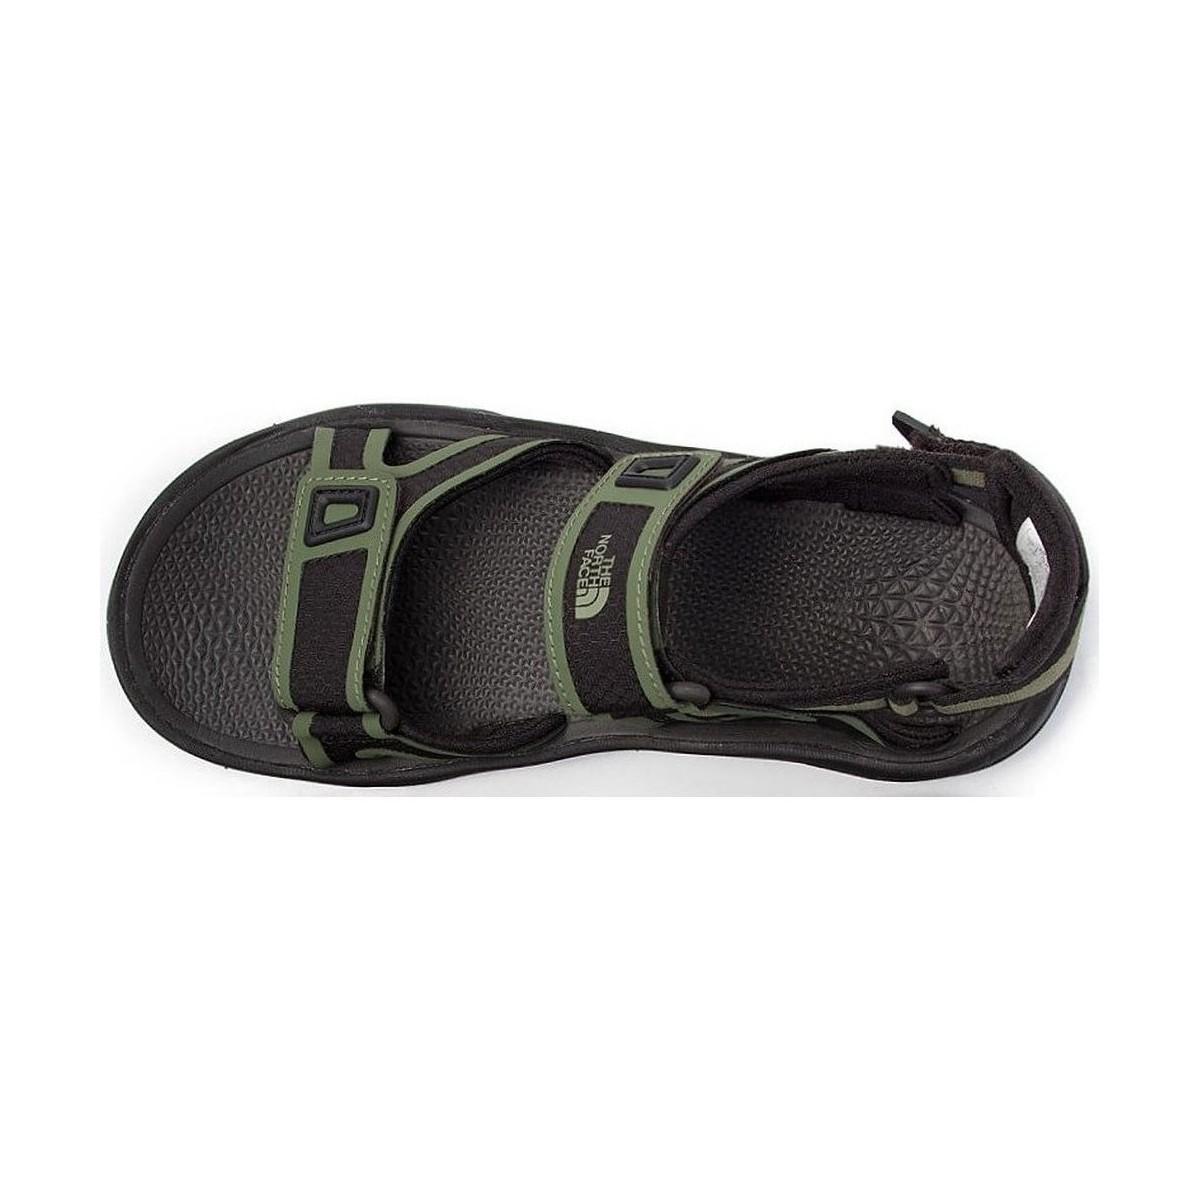 10c9edd7d The North Face Hedgehog Sandal Ii Men's Sandals In Multicolour in ...